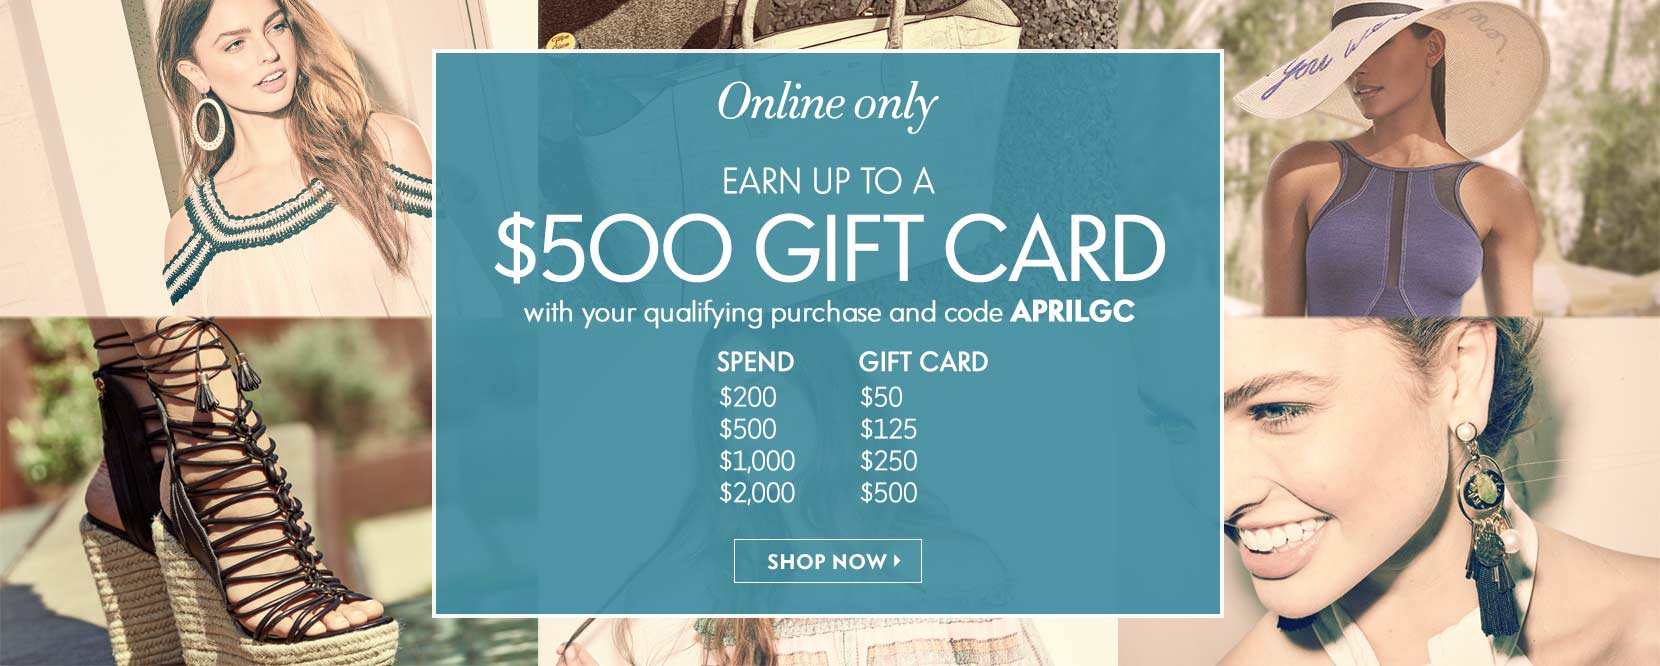 Neiman Marcus Gift Card Event, Nordstrom 20% off Bobbi Brown ...